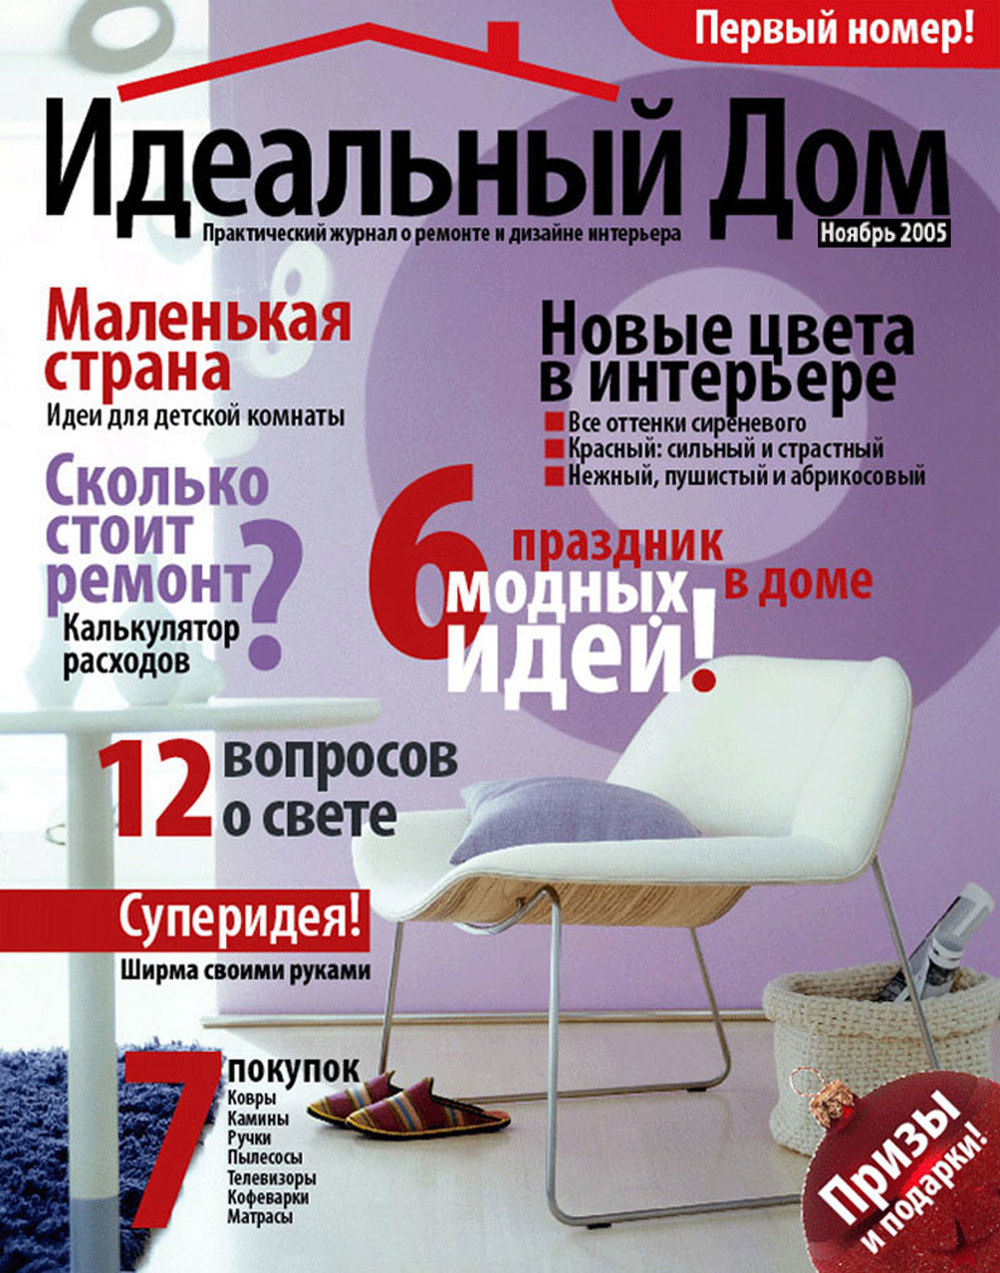 jurnal_n_1-792.jpg